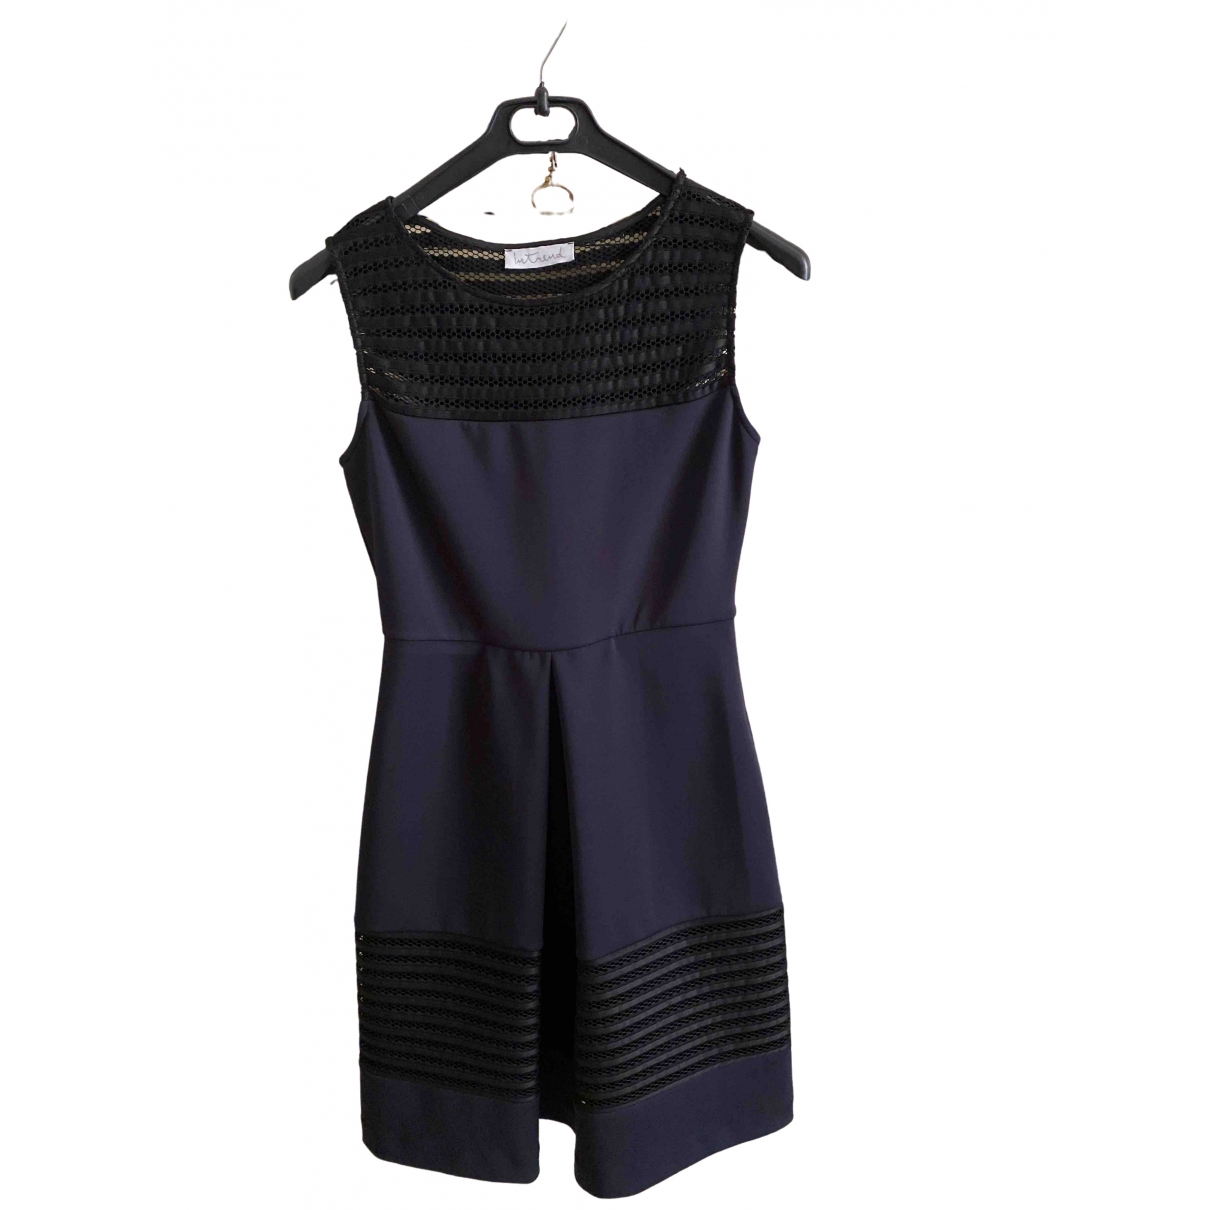 Intrend \N Black dress for Women S International